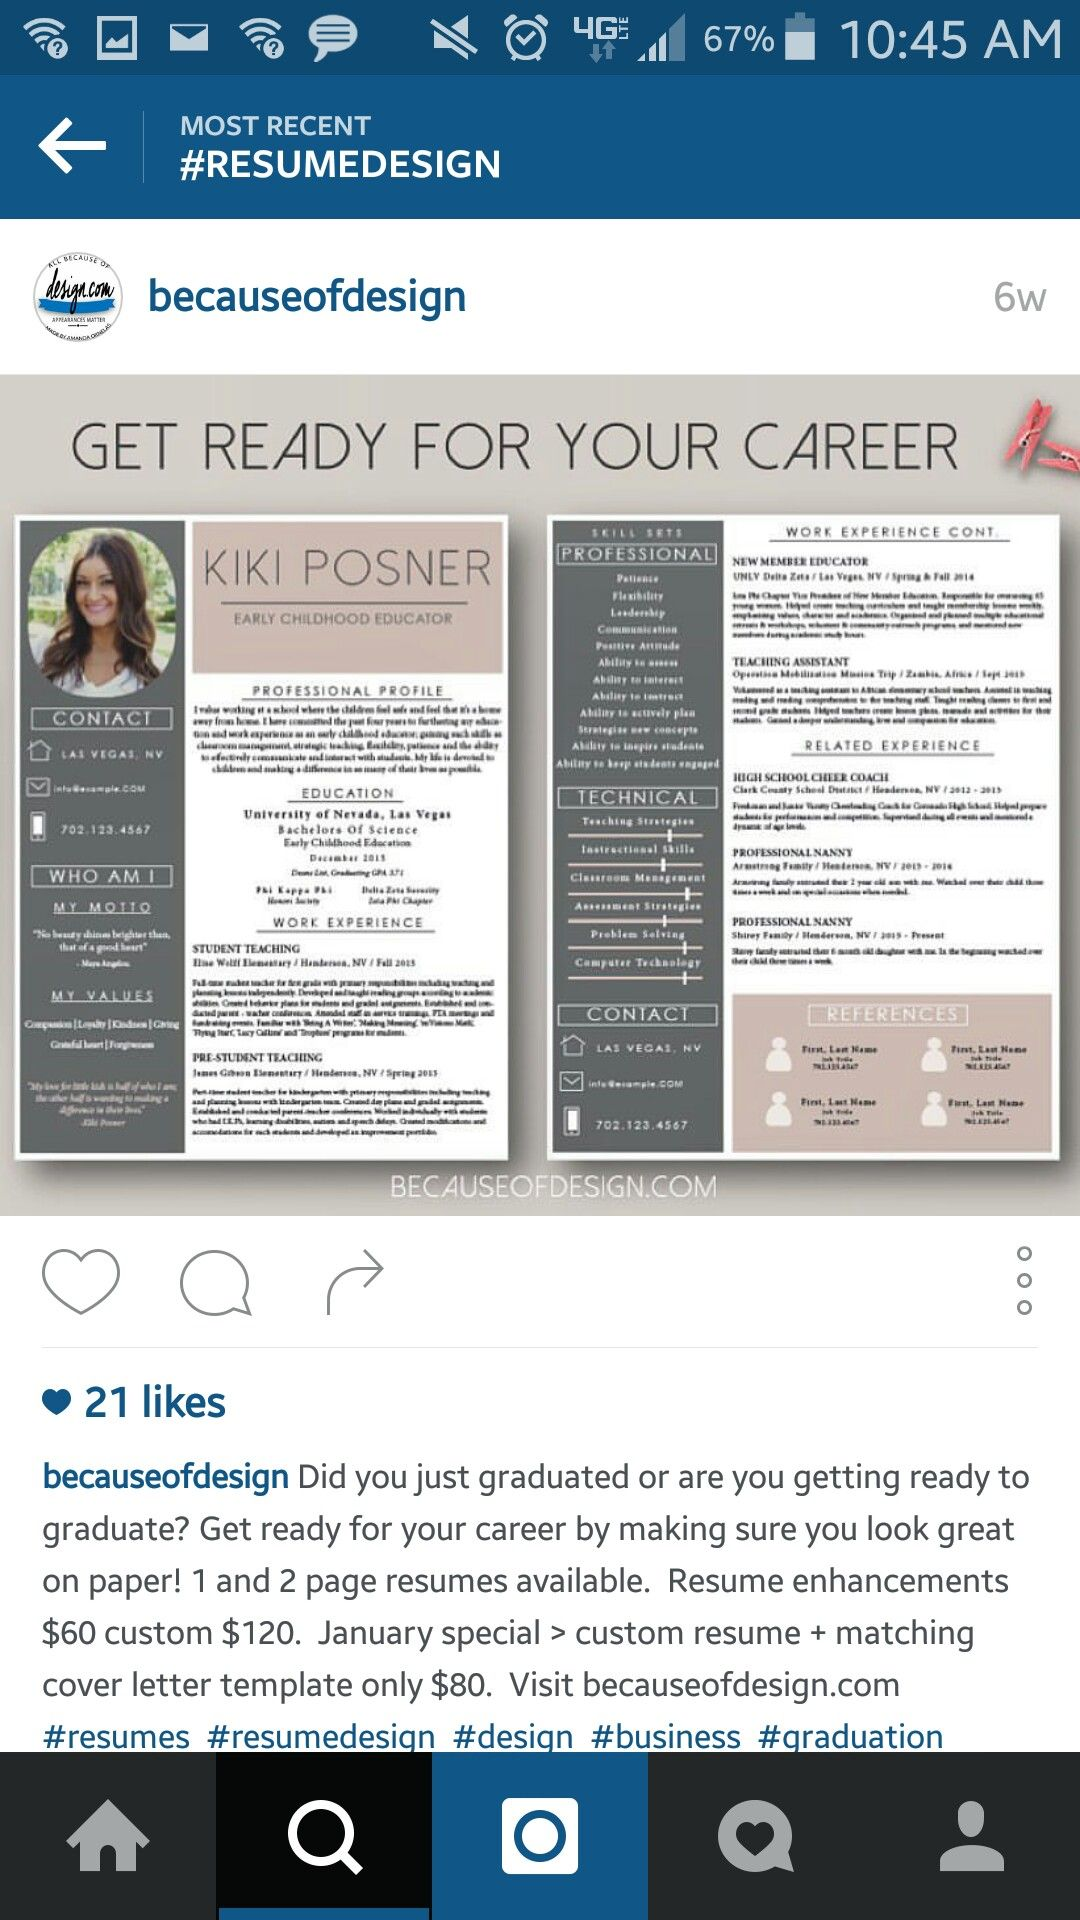 Pin by travae zachery on getting the dream job resume